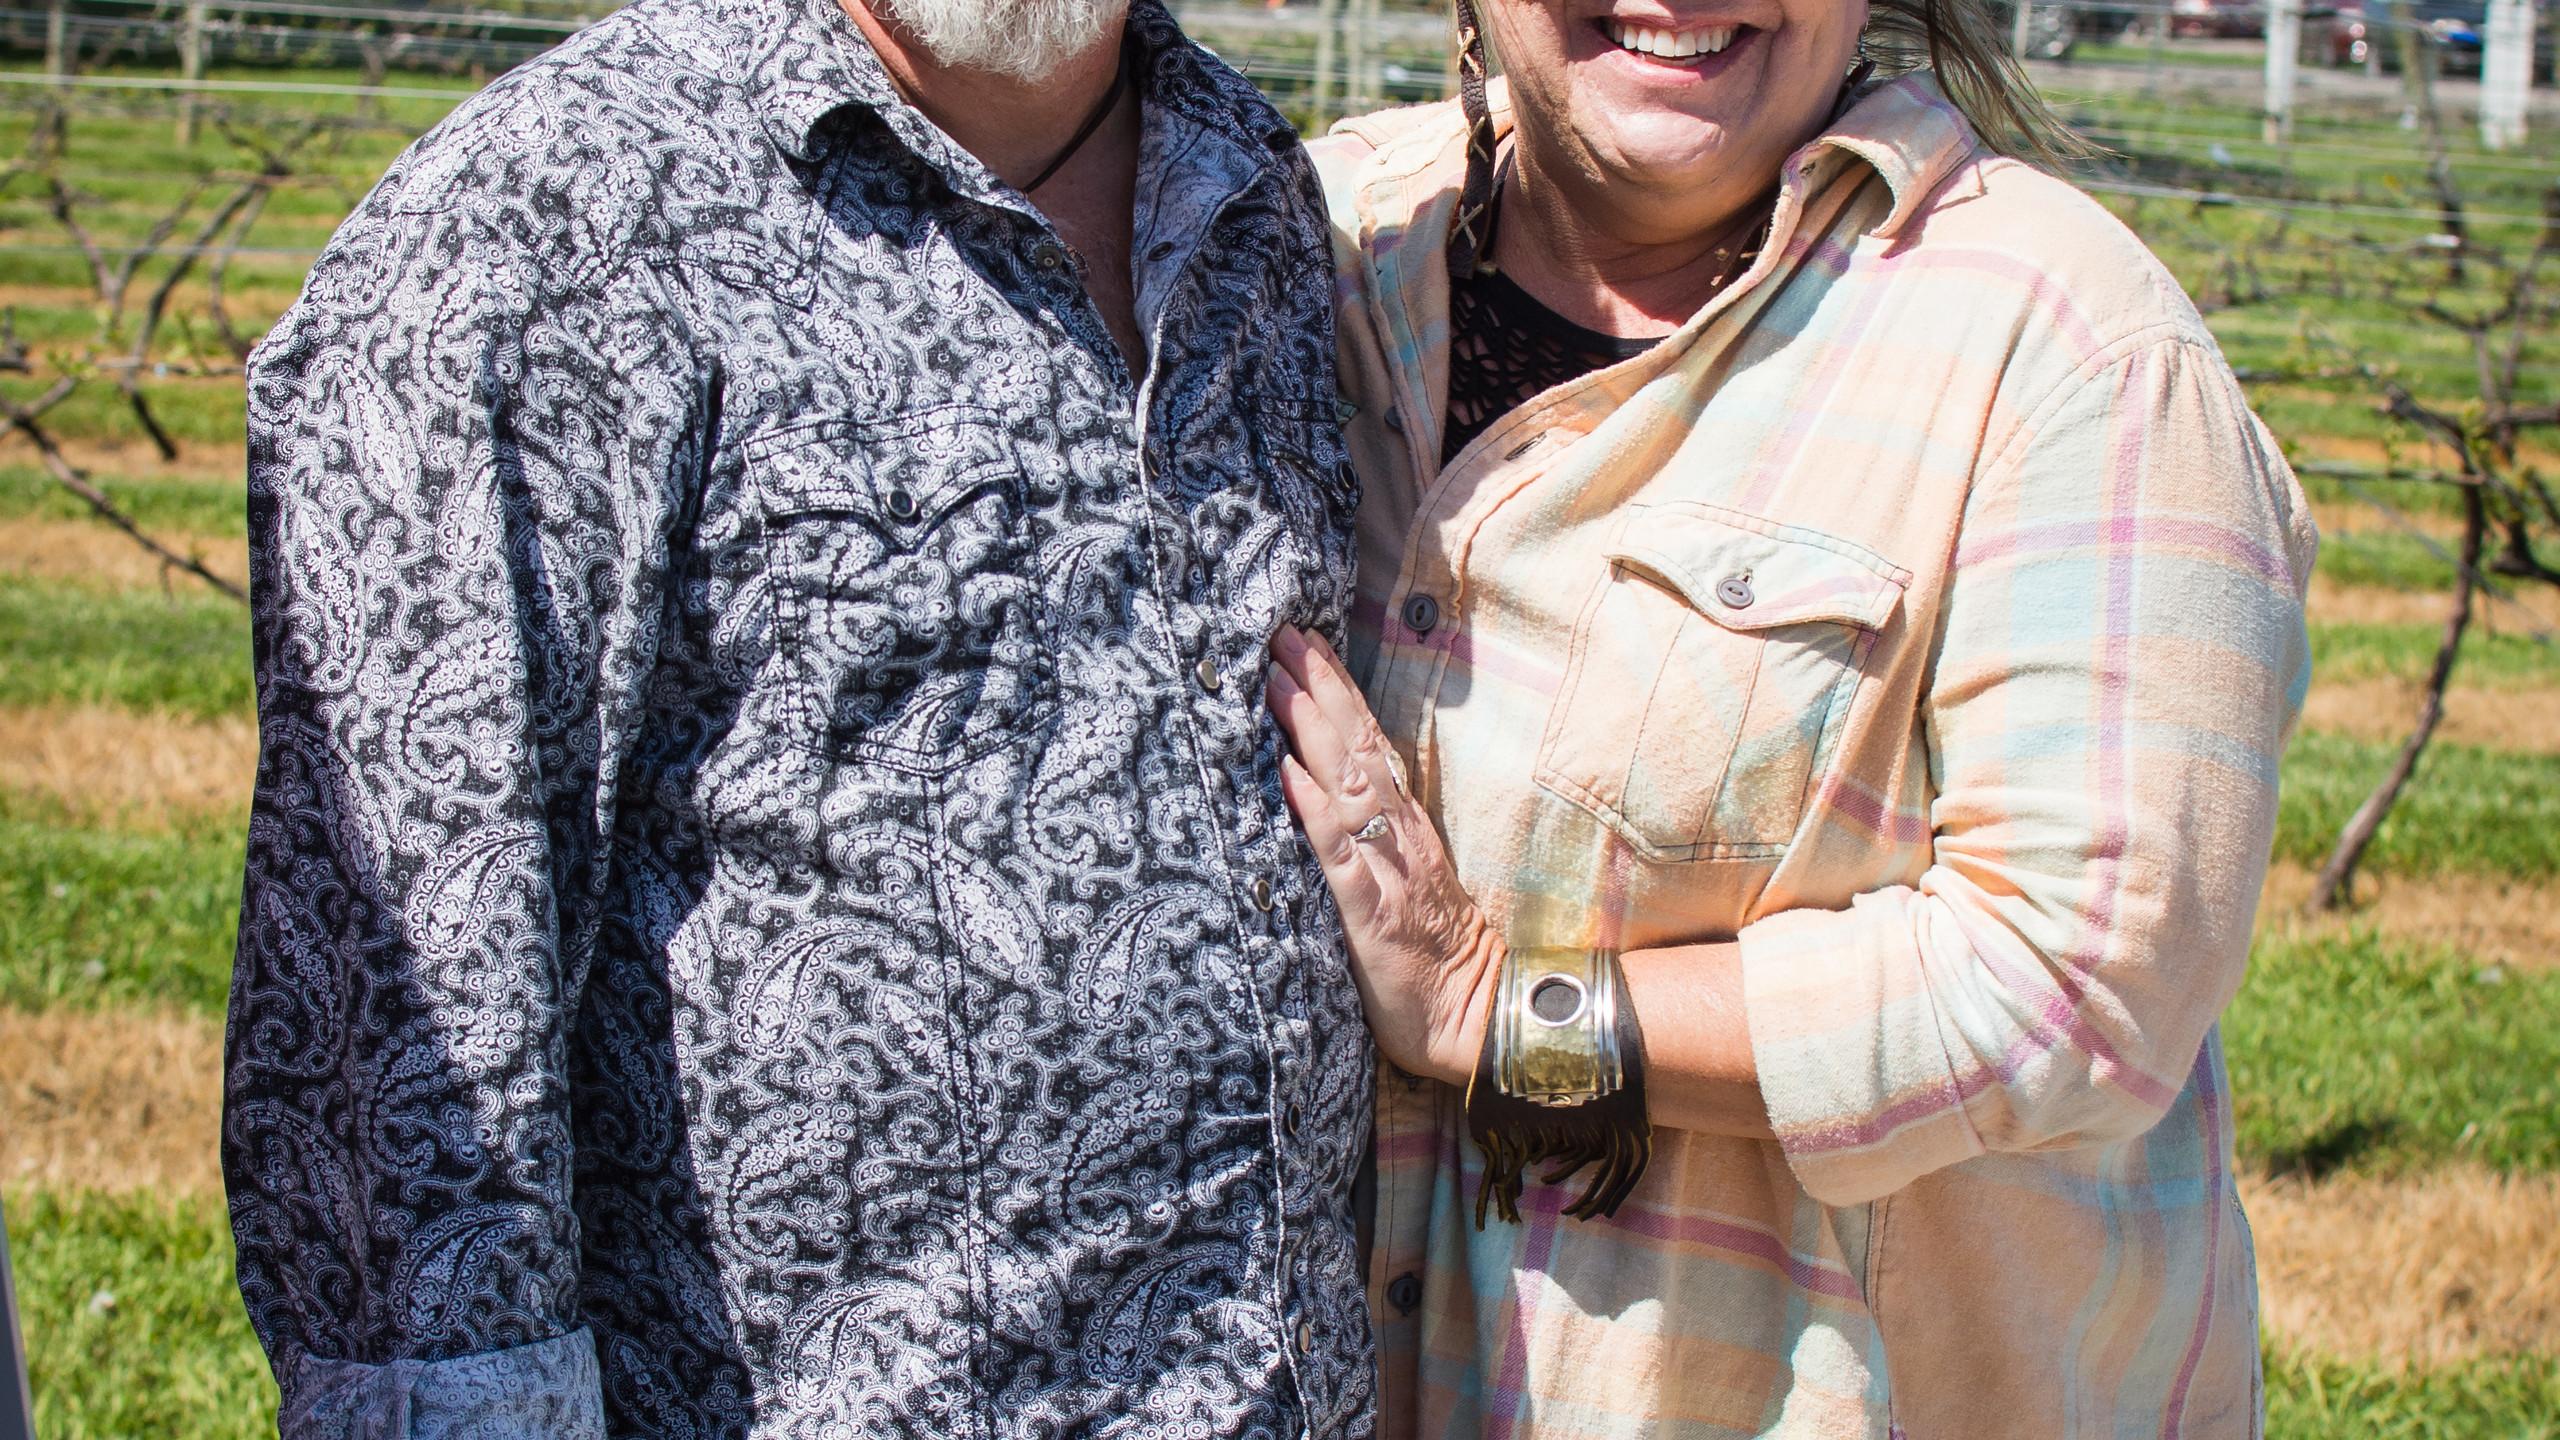 Darrell and Becky Martin